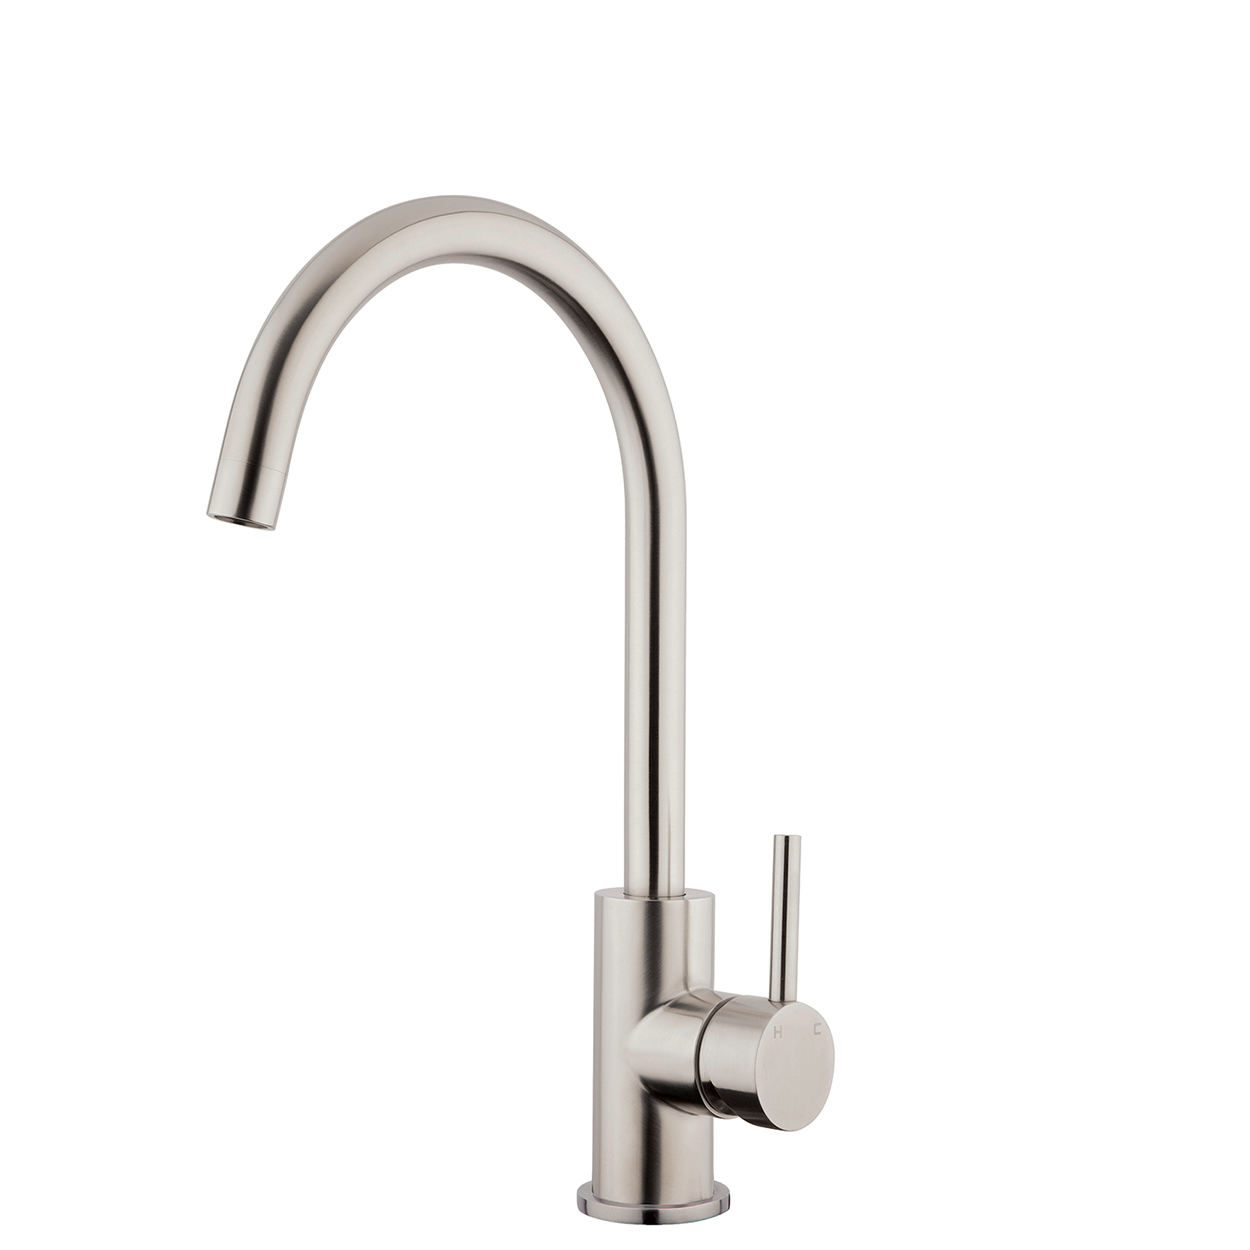 FORENO PURITY Minimal Gooseneck Sink Mixer | Stainless Steel (FSSS1)